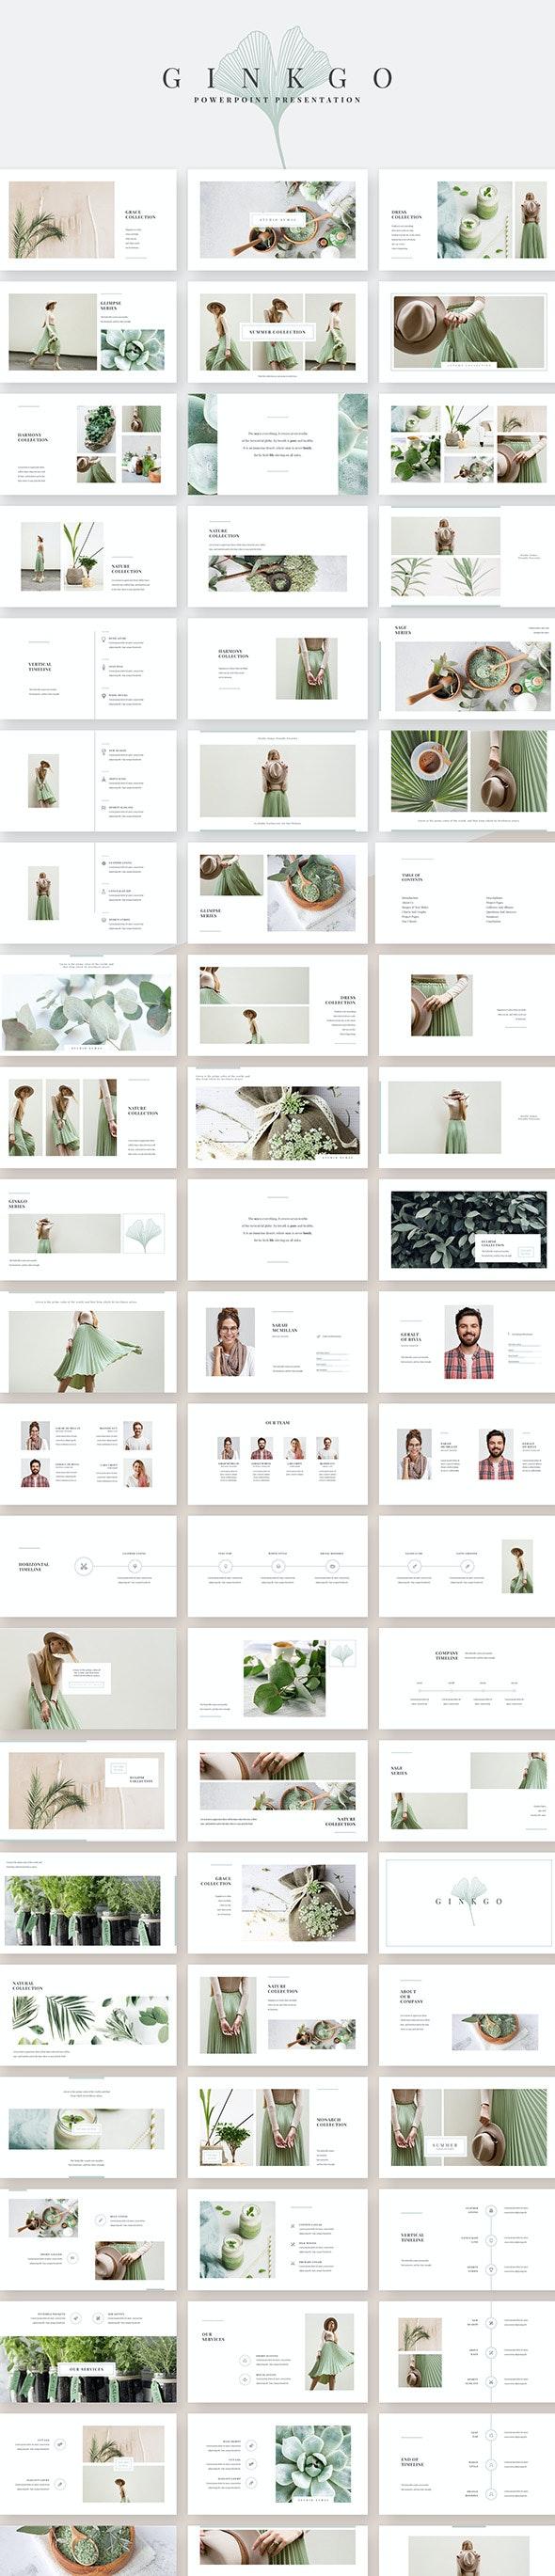 Ginkgo PowerPoint Template - Creative PowerPoint Templates